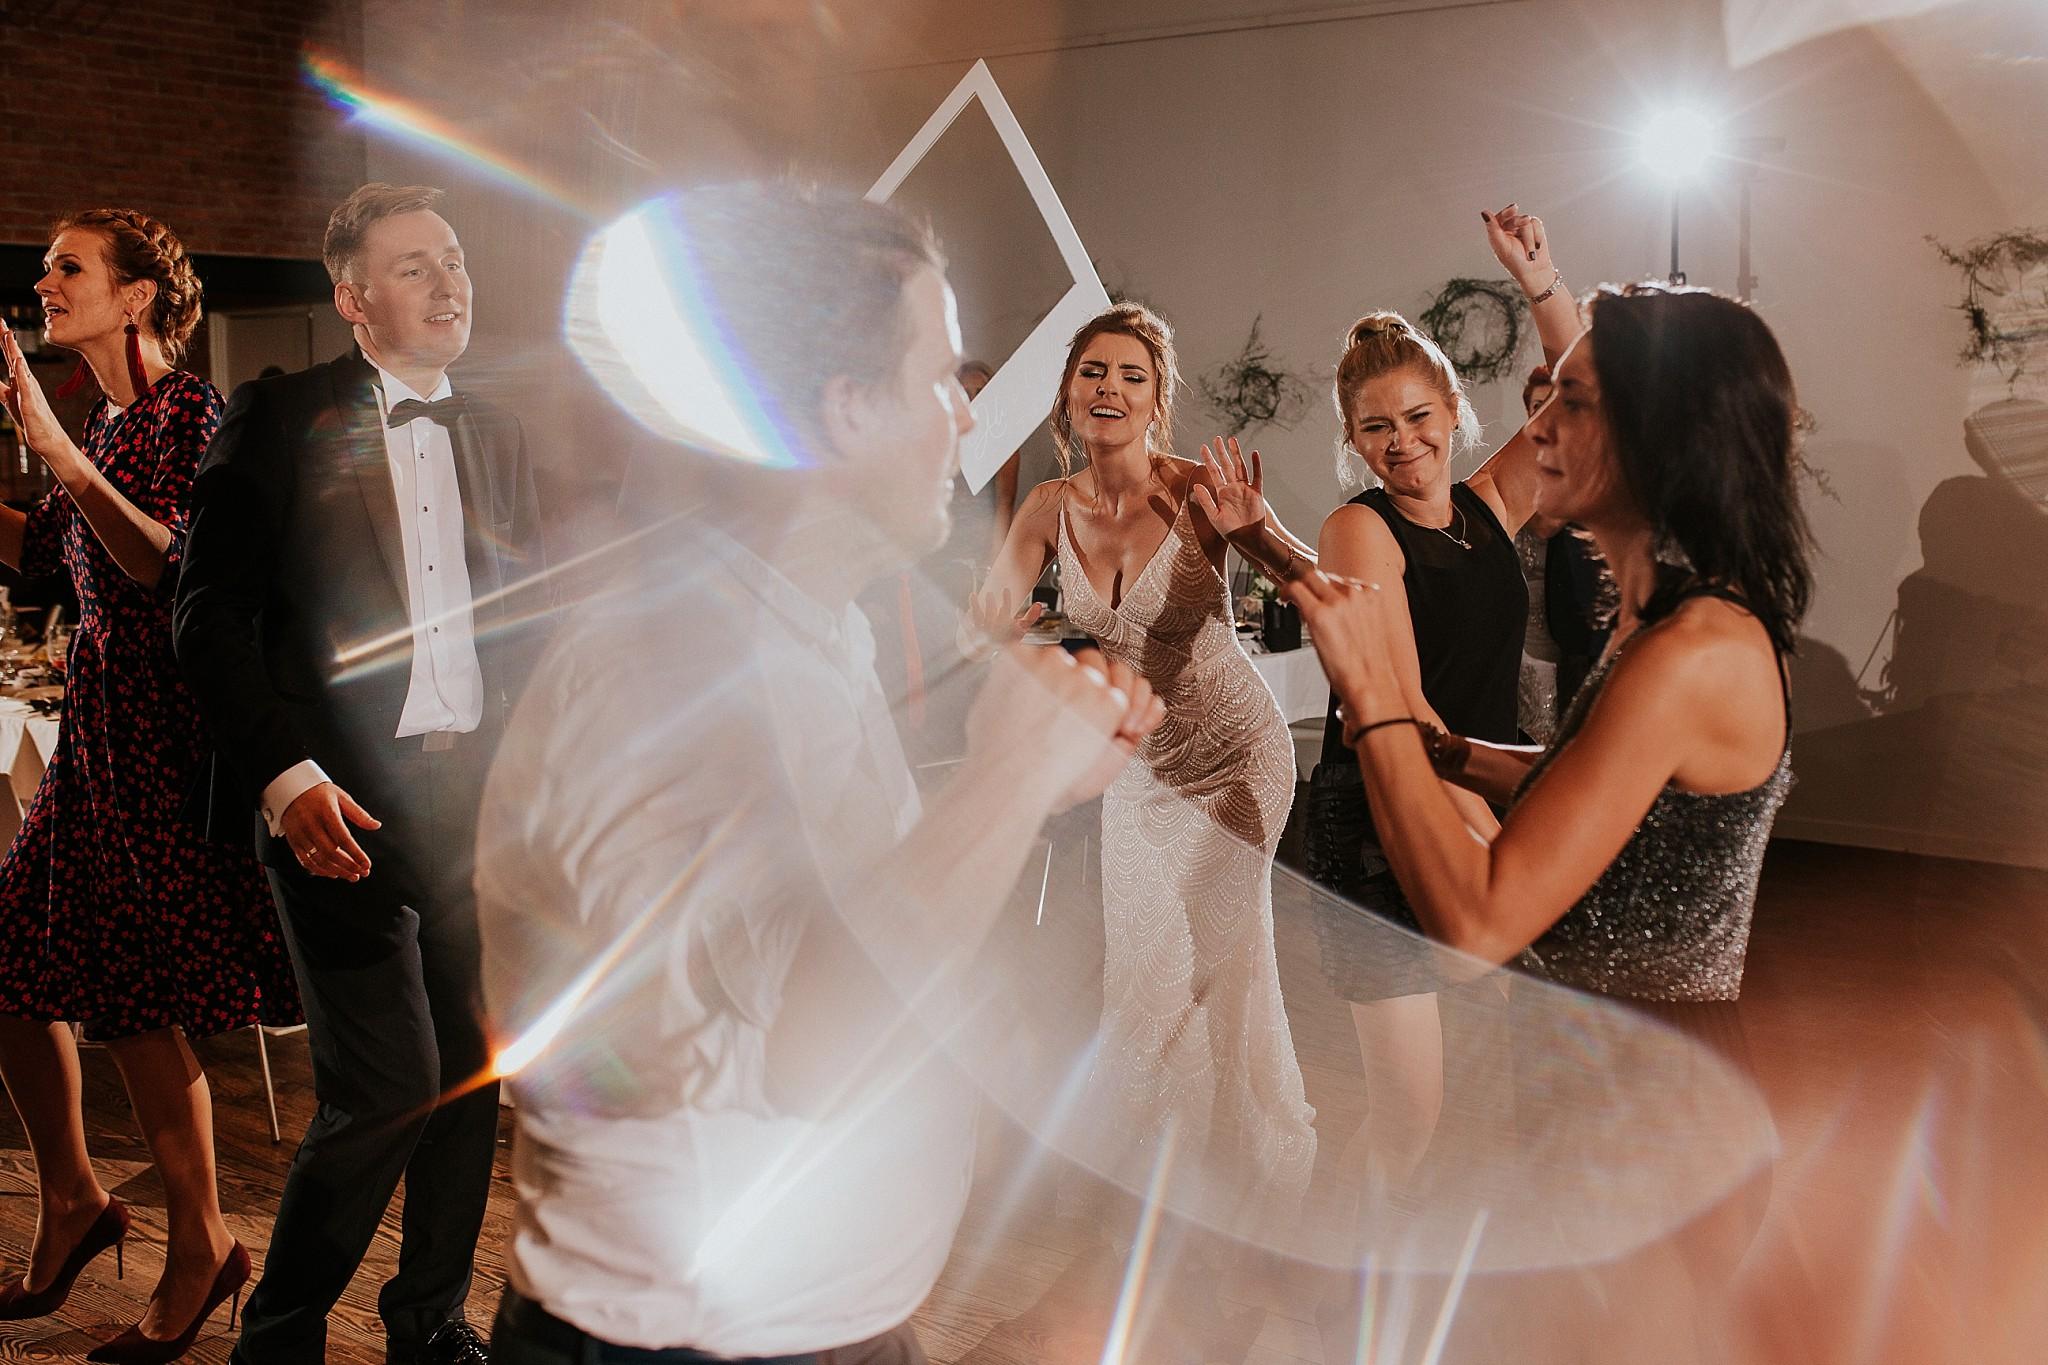 fotograf poznan wesele dobra truskawka piekne wesele pod poznaniem wesele w dobrej truskawce piekna para mloda slub marzen slub koronawirus slub listopad wesele koronawirus 451